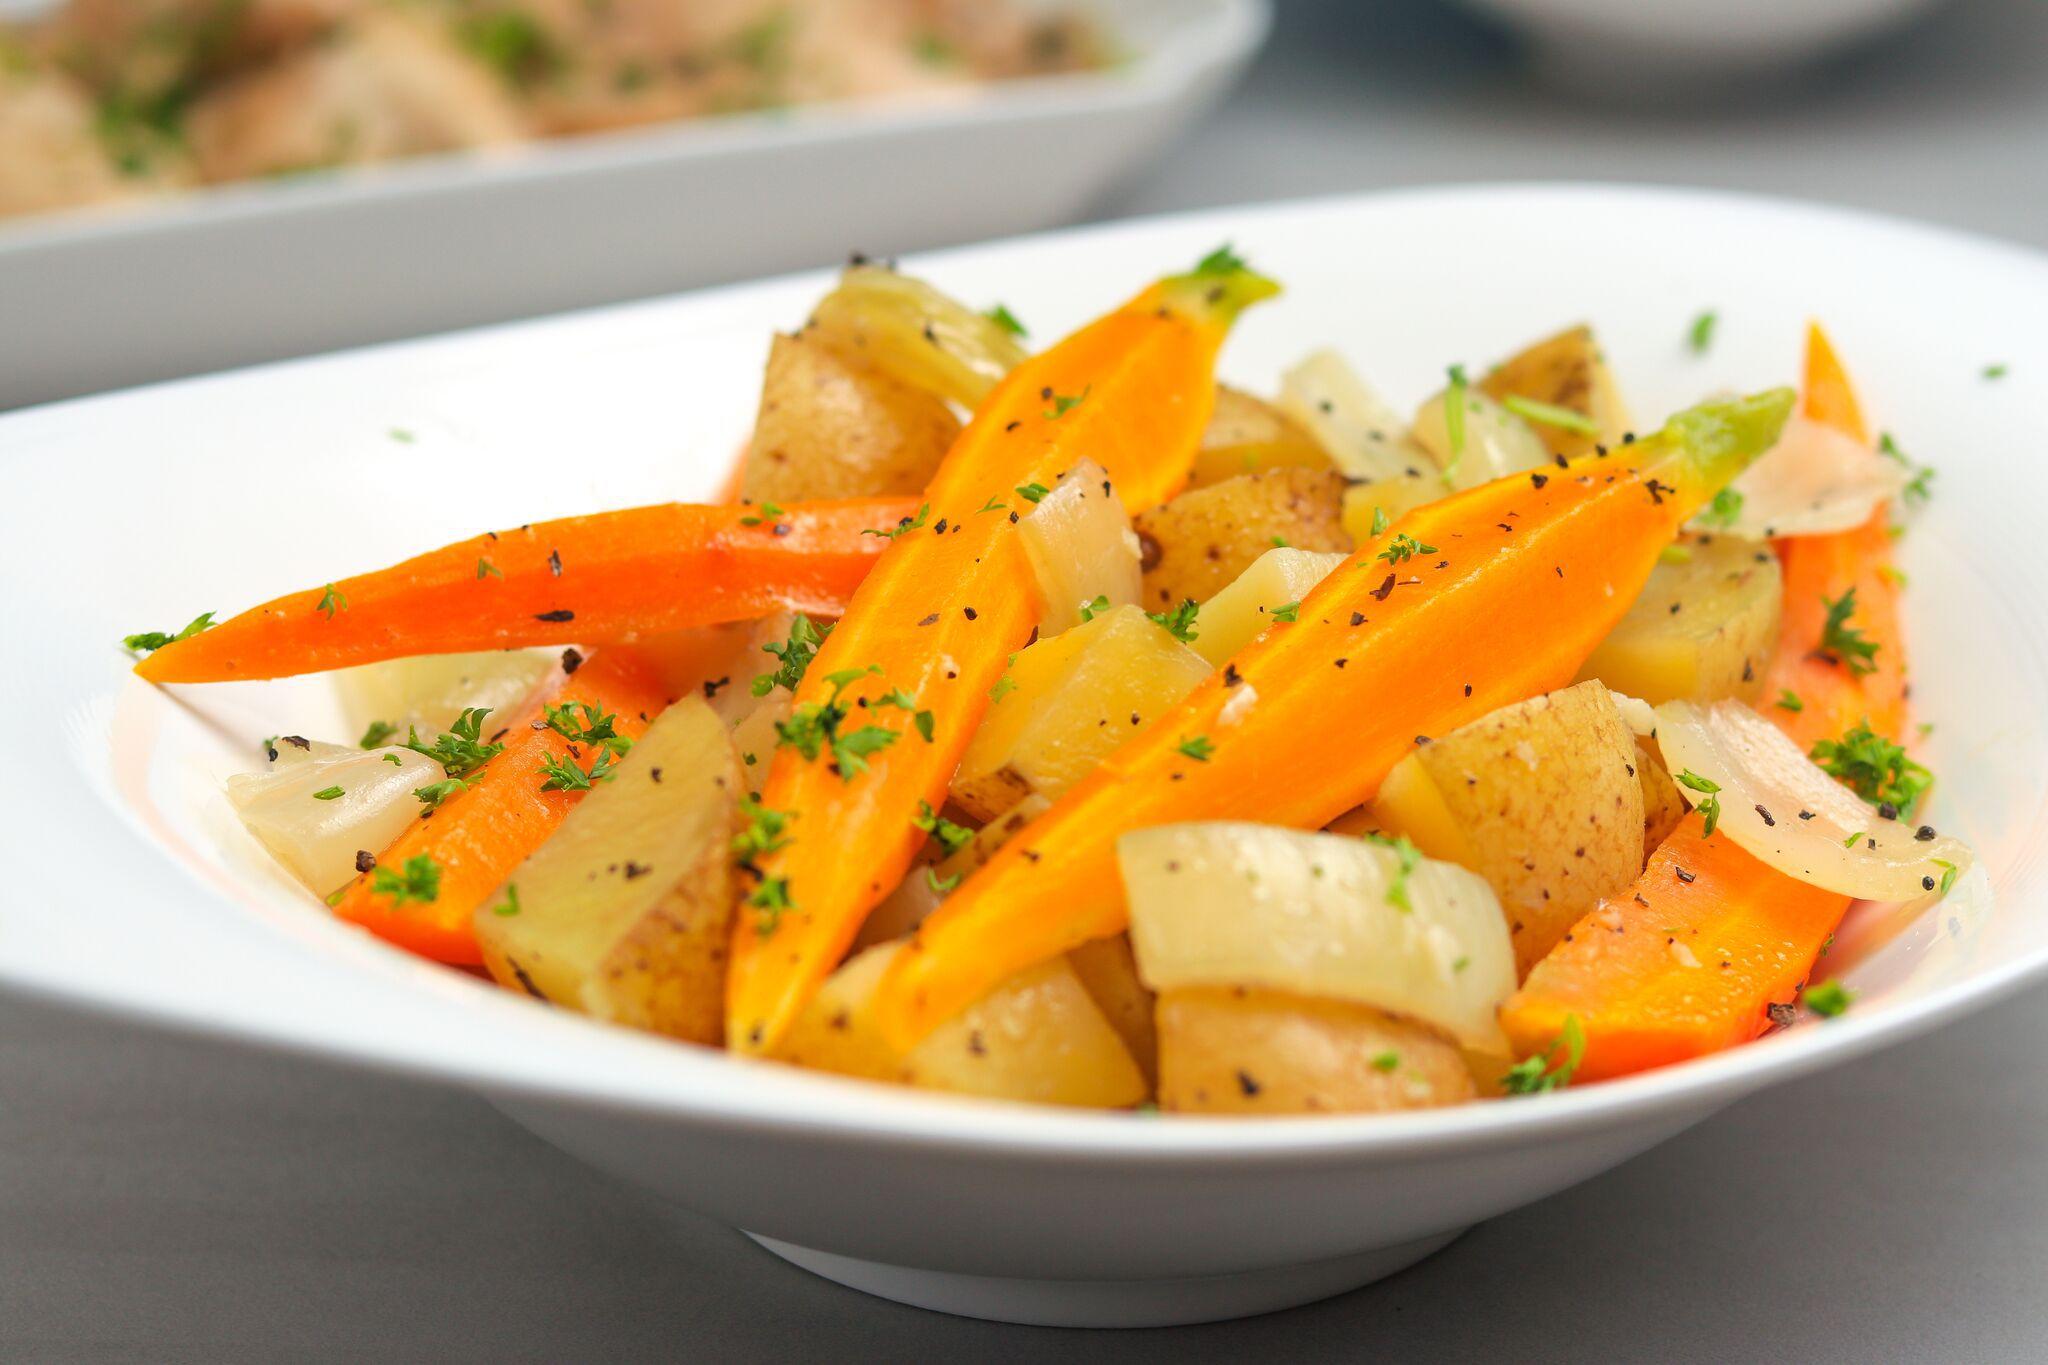 easy crock pot pork roast with potatoes and carrots